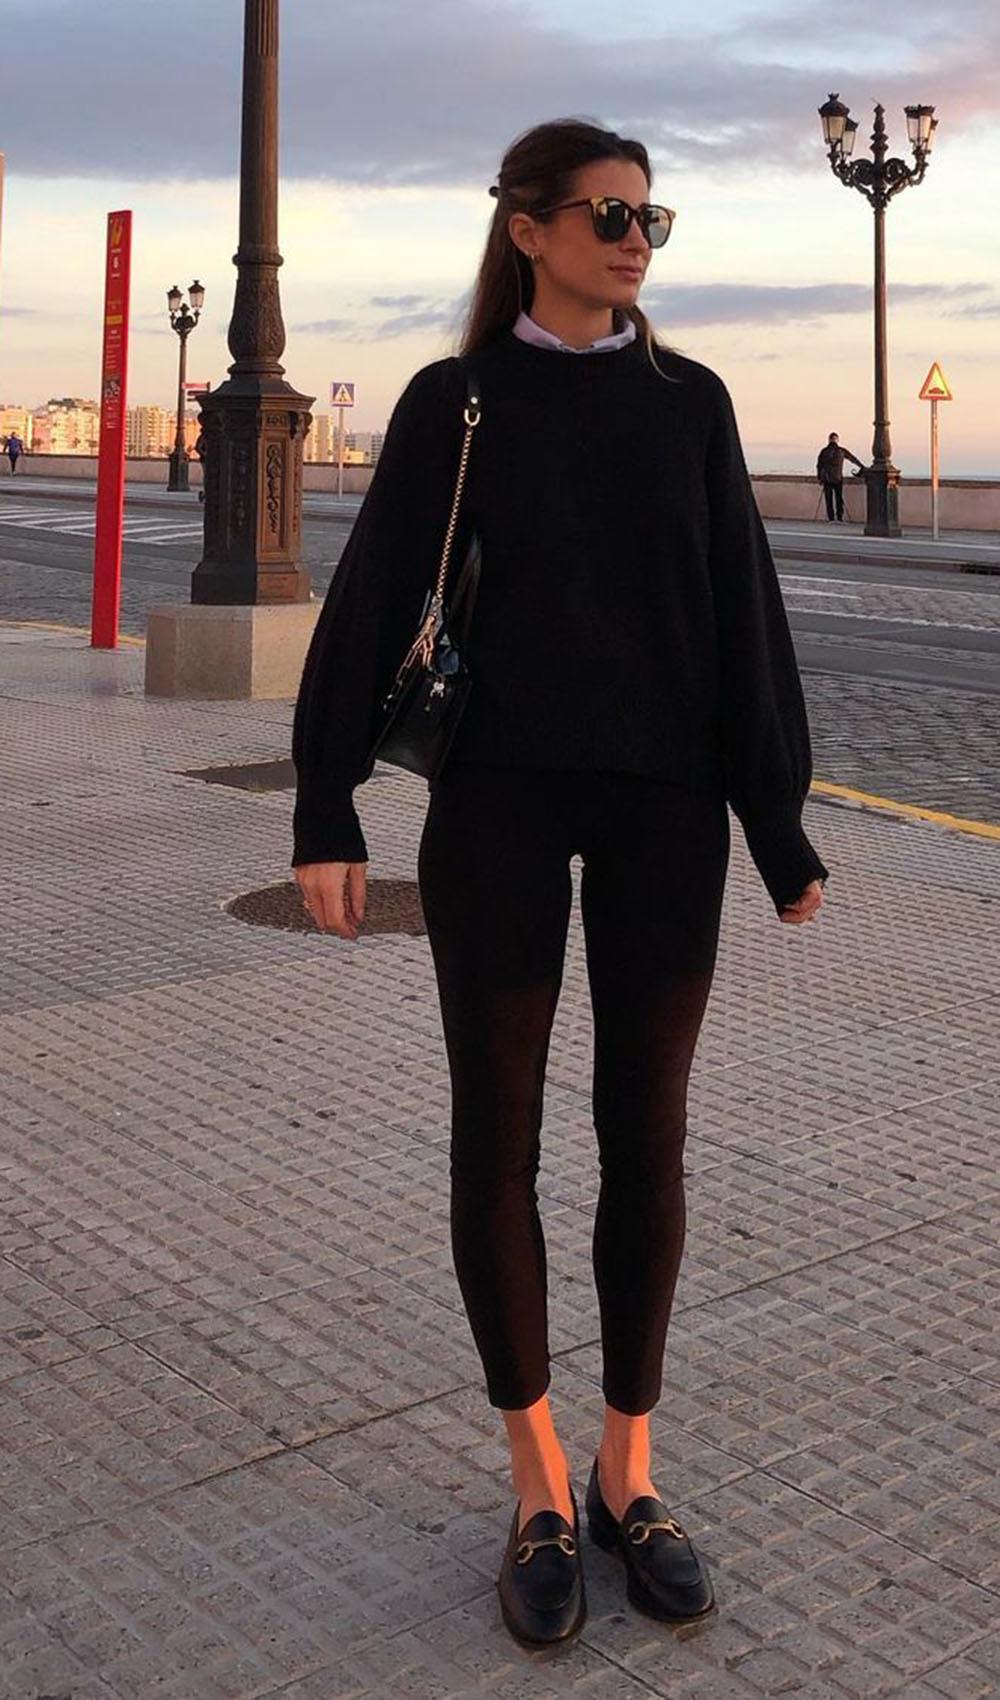 blusa de moletom no look all black